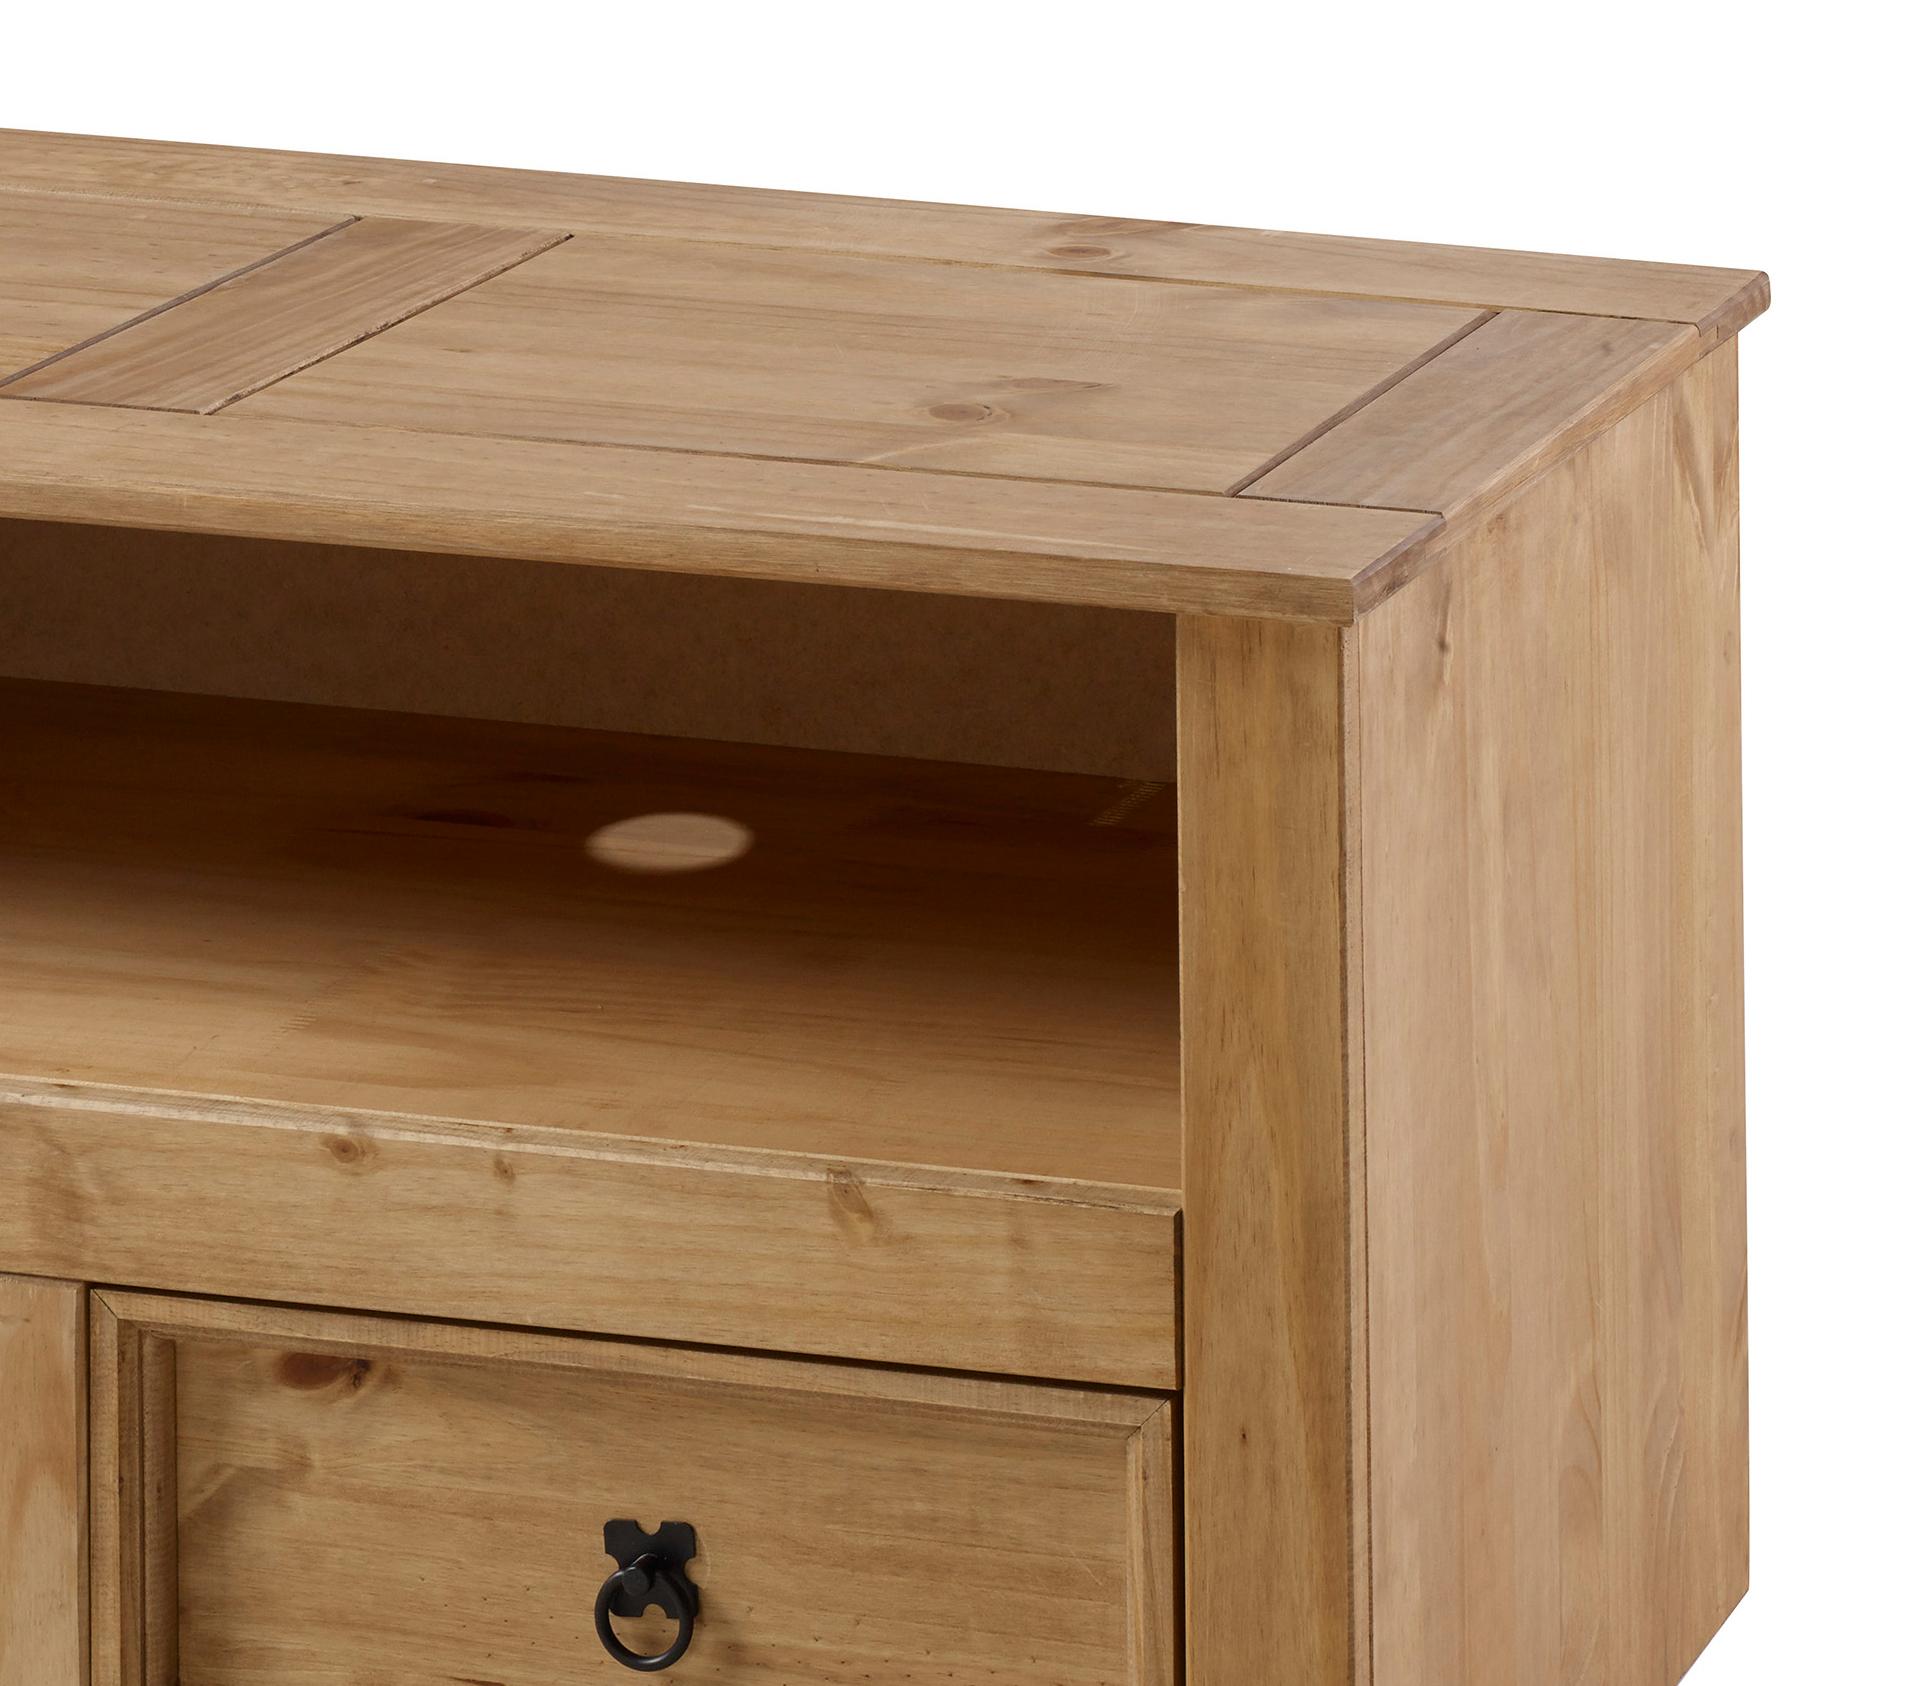 massivholz kiefer cheap babybett massiv weiss a x kiefer massivholz with massivholz kiefer. Black Bedroom Furniture Sets. Home Design Ideas